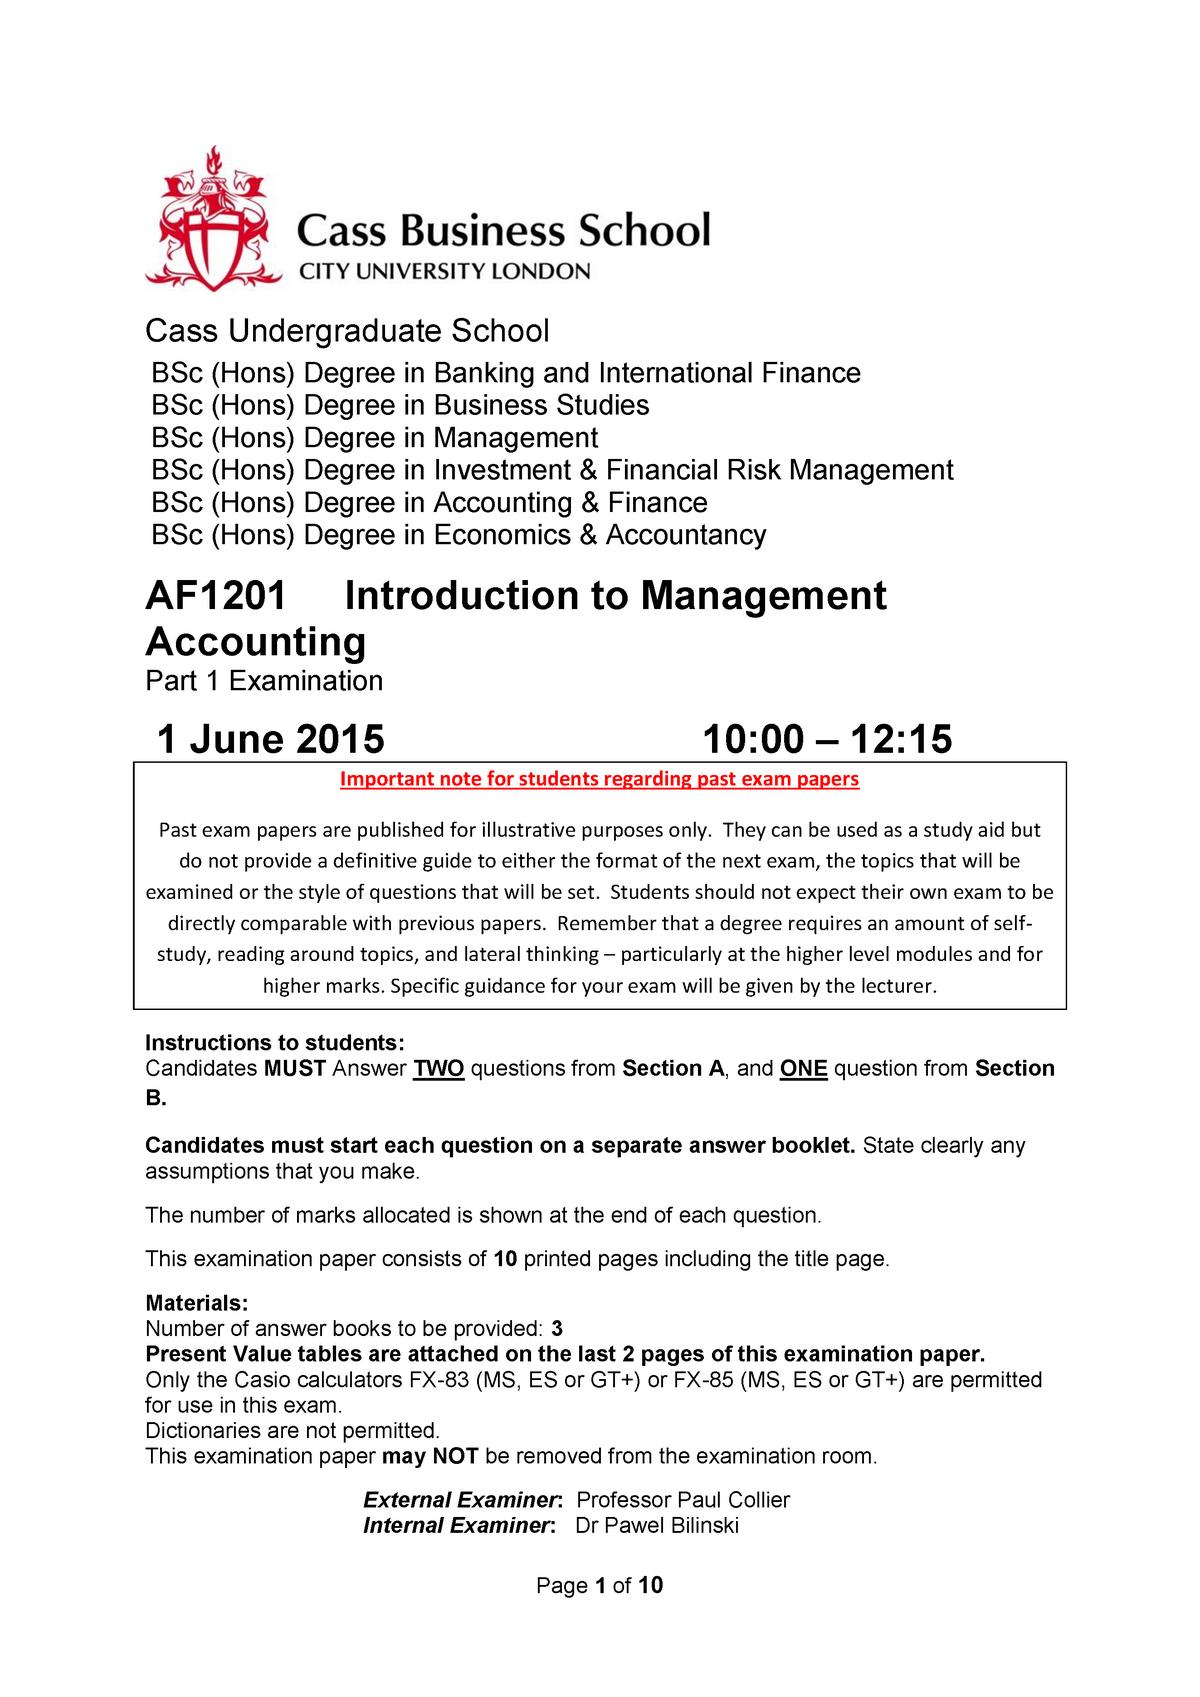 Exam 2015 - AF1201: Introductory Management Accounting - StuDocu